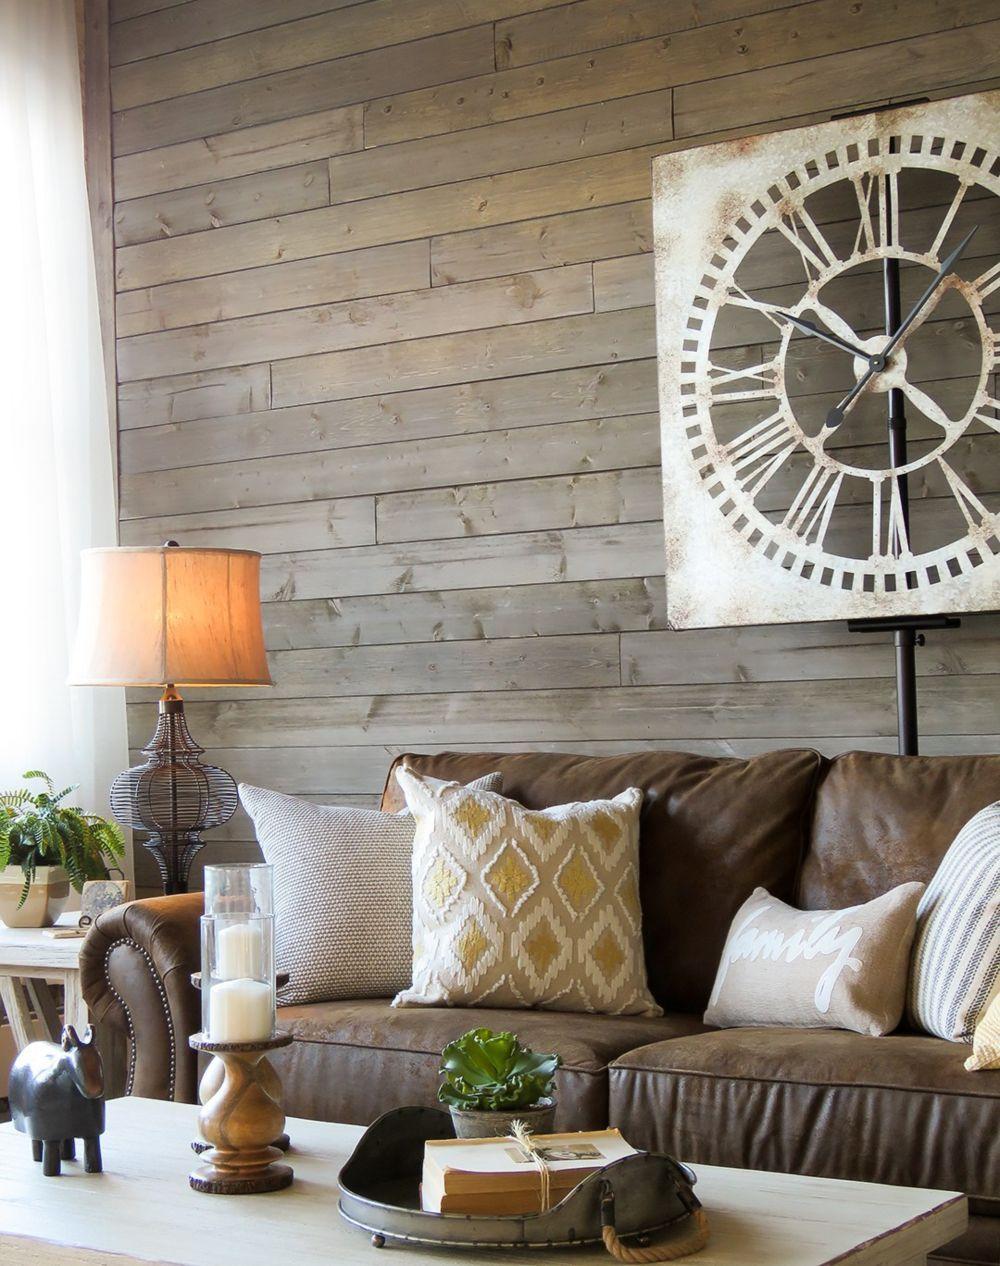 39 simple rustic farmhouse living room decor ideas brown